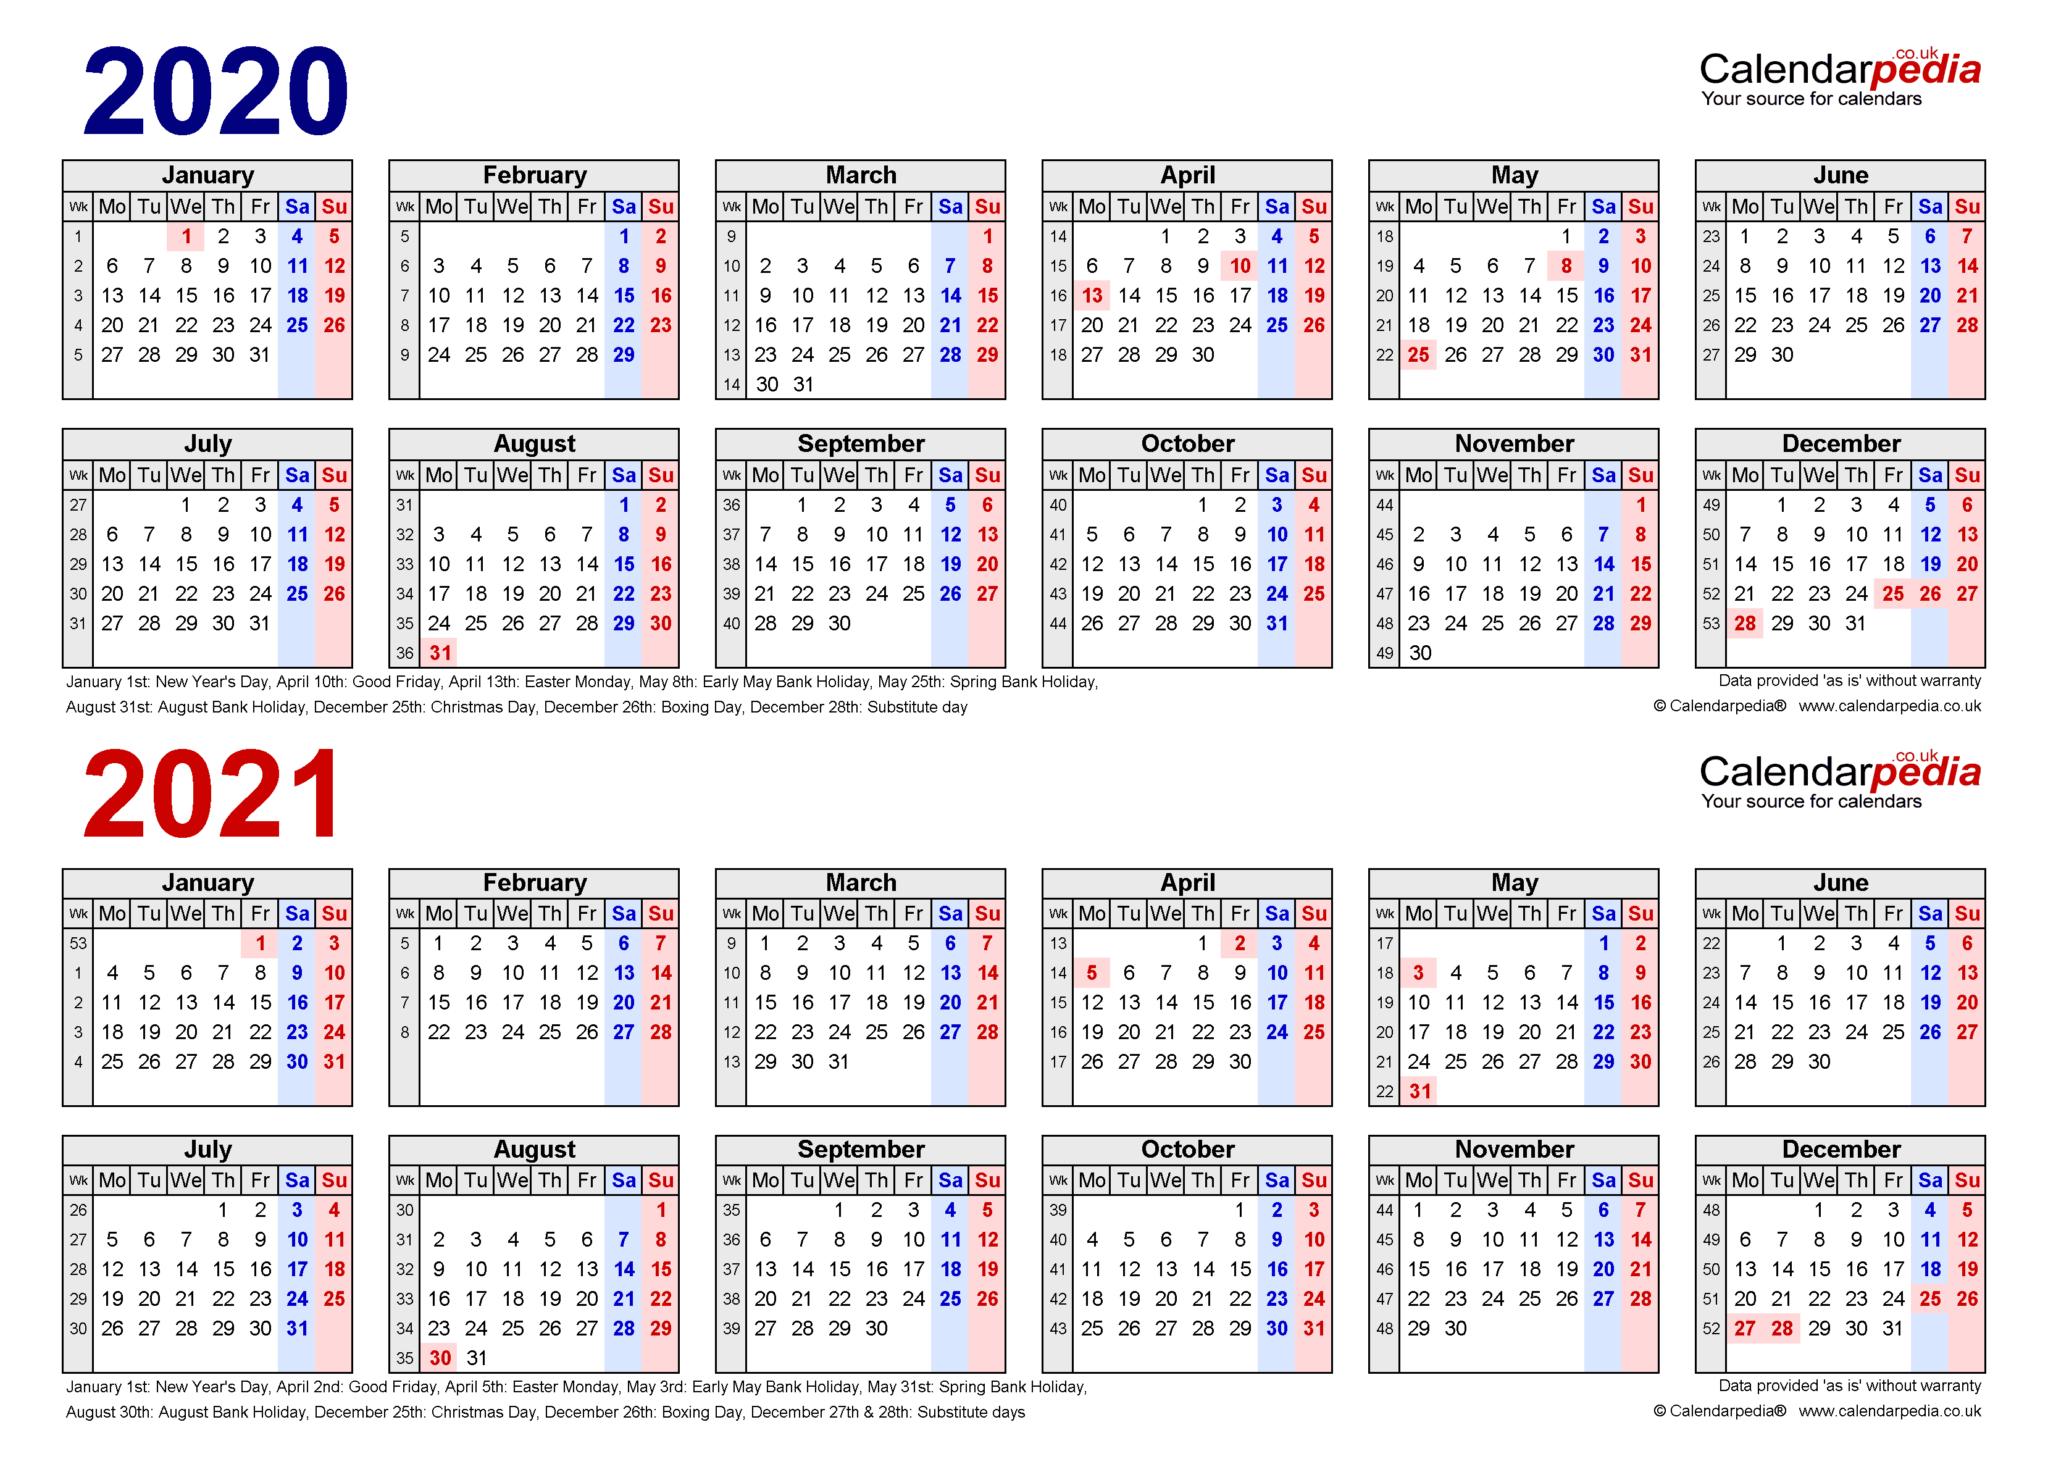 2021 Monthly Calendar Editable - Printablecalendarsfor2021